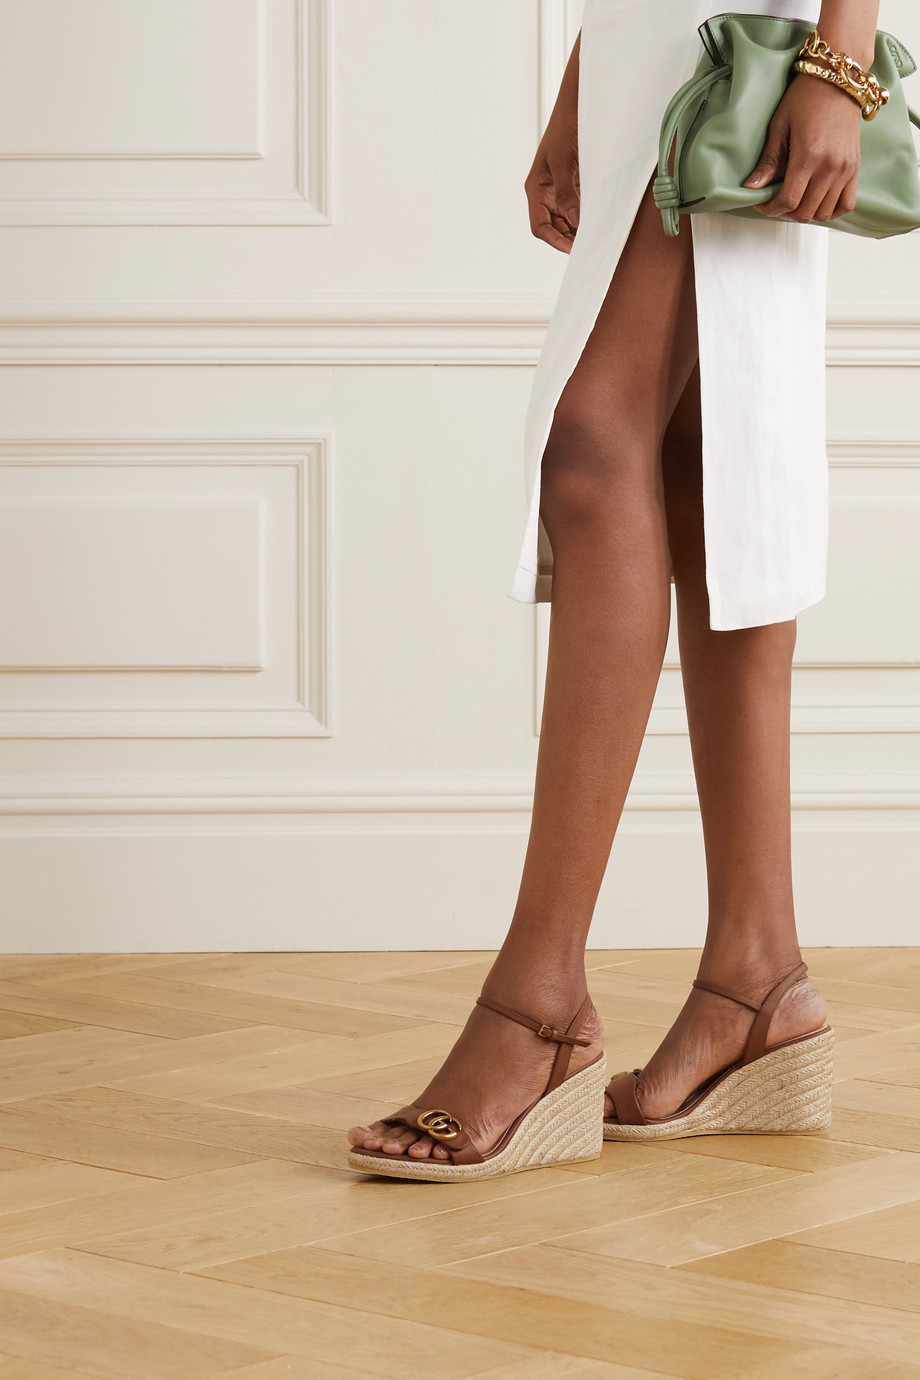 Gucci Aitana 85 leather espadrille wedge sandals